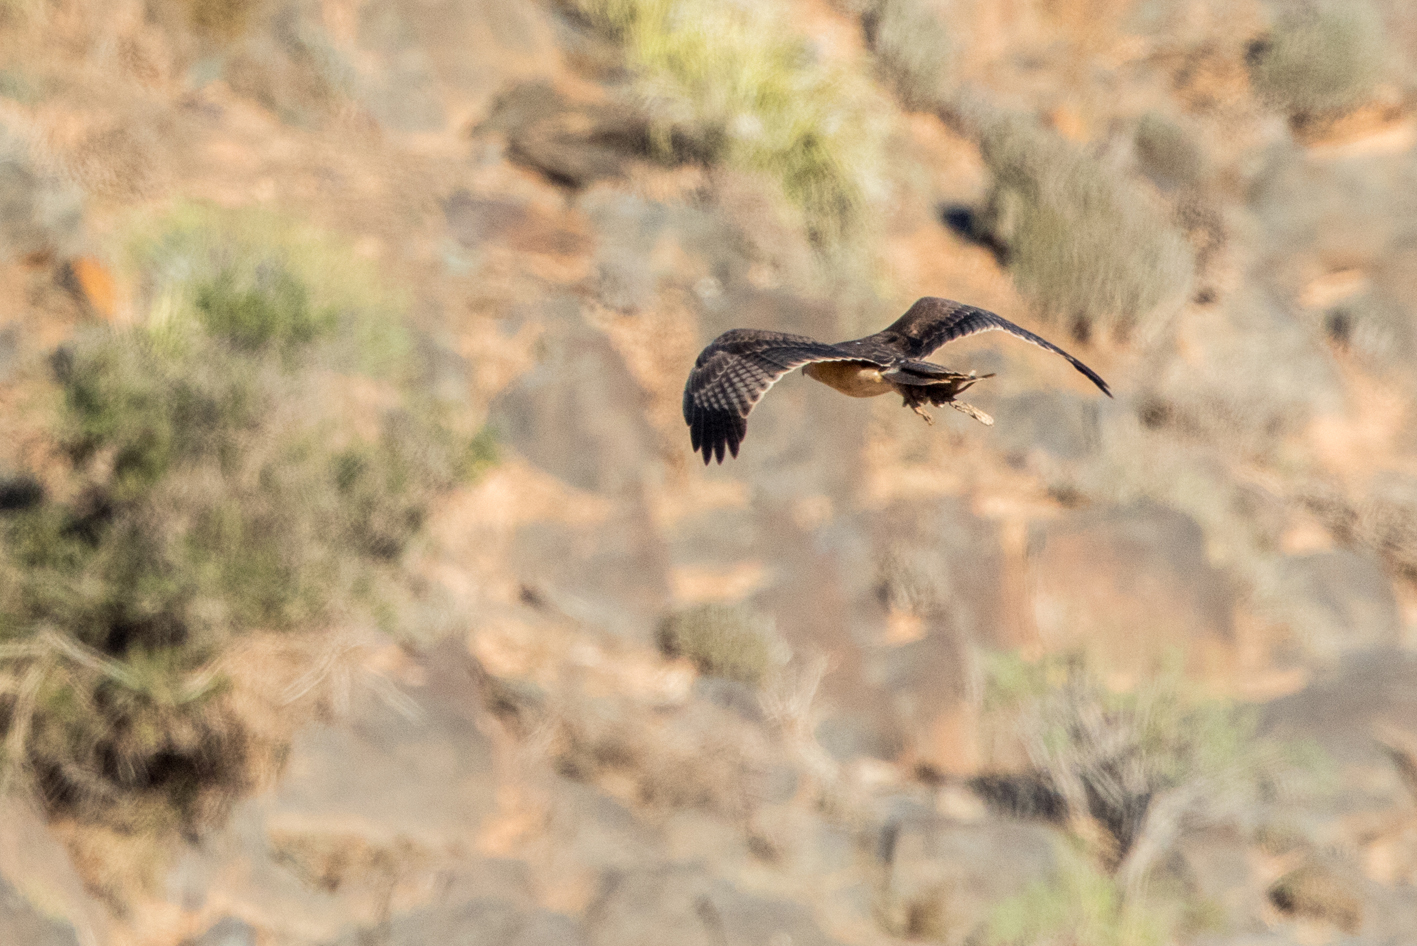 Bonelli's Eagle (Aquila fasciata) carrying a Fat Sand Rat (Psammomys obesus), Guelmim region, Morocco, 7 Nov 2015 (Ali Irizi)